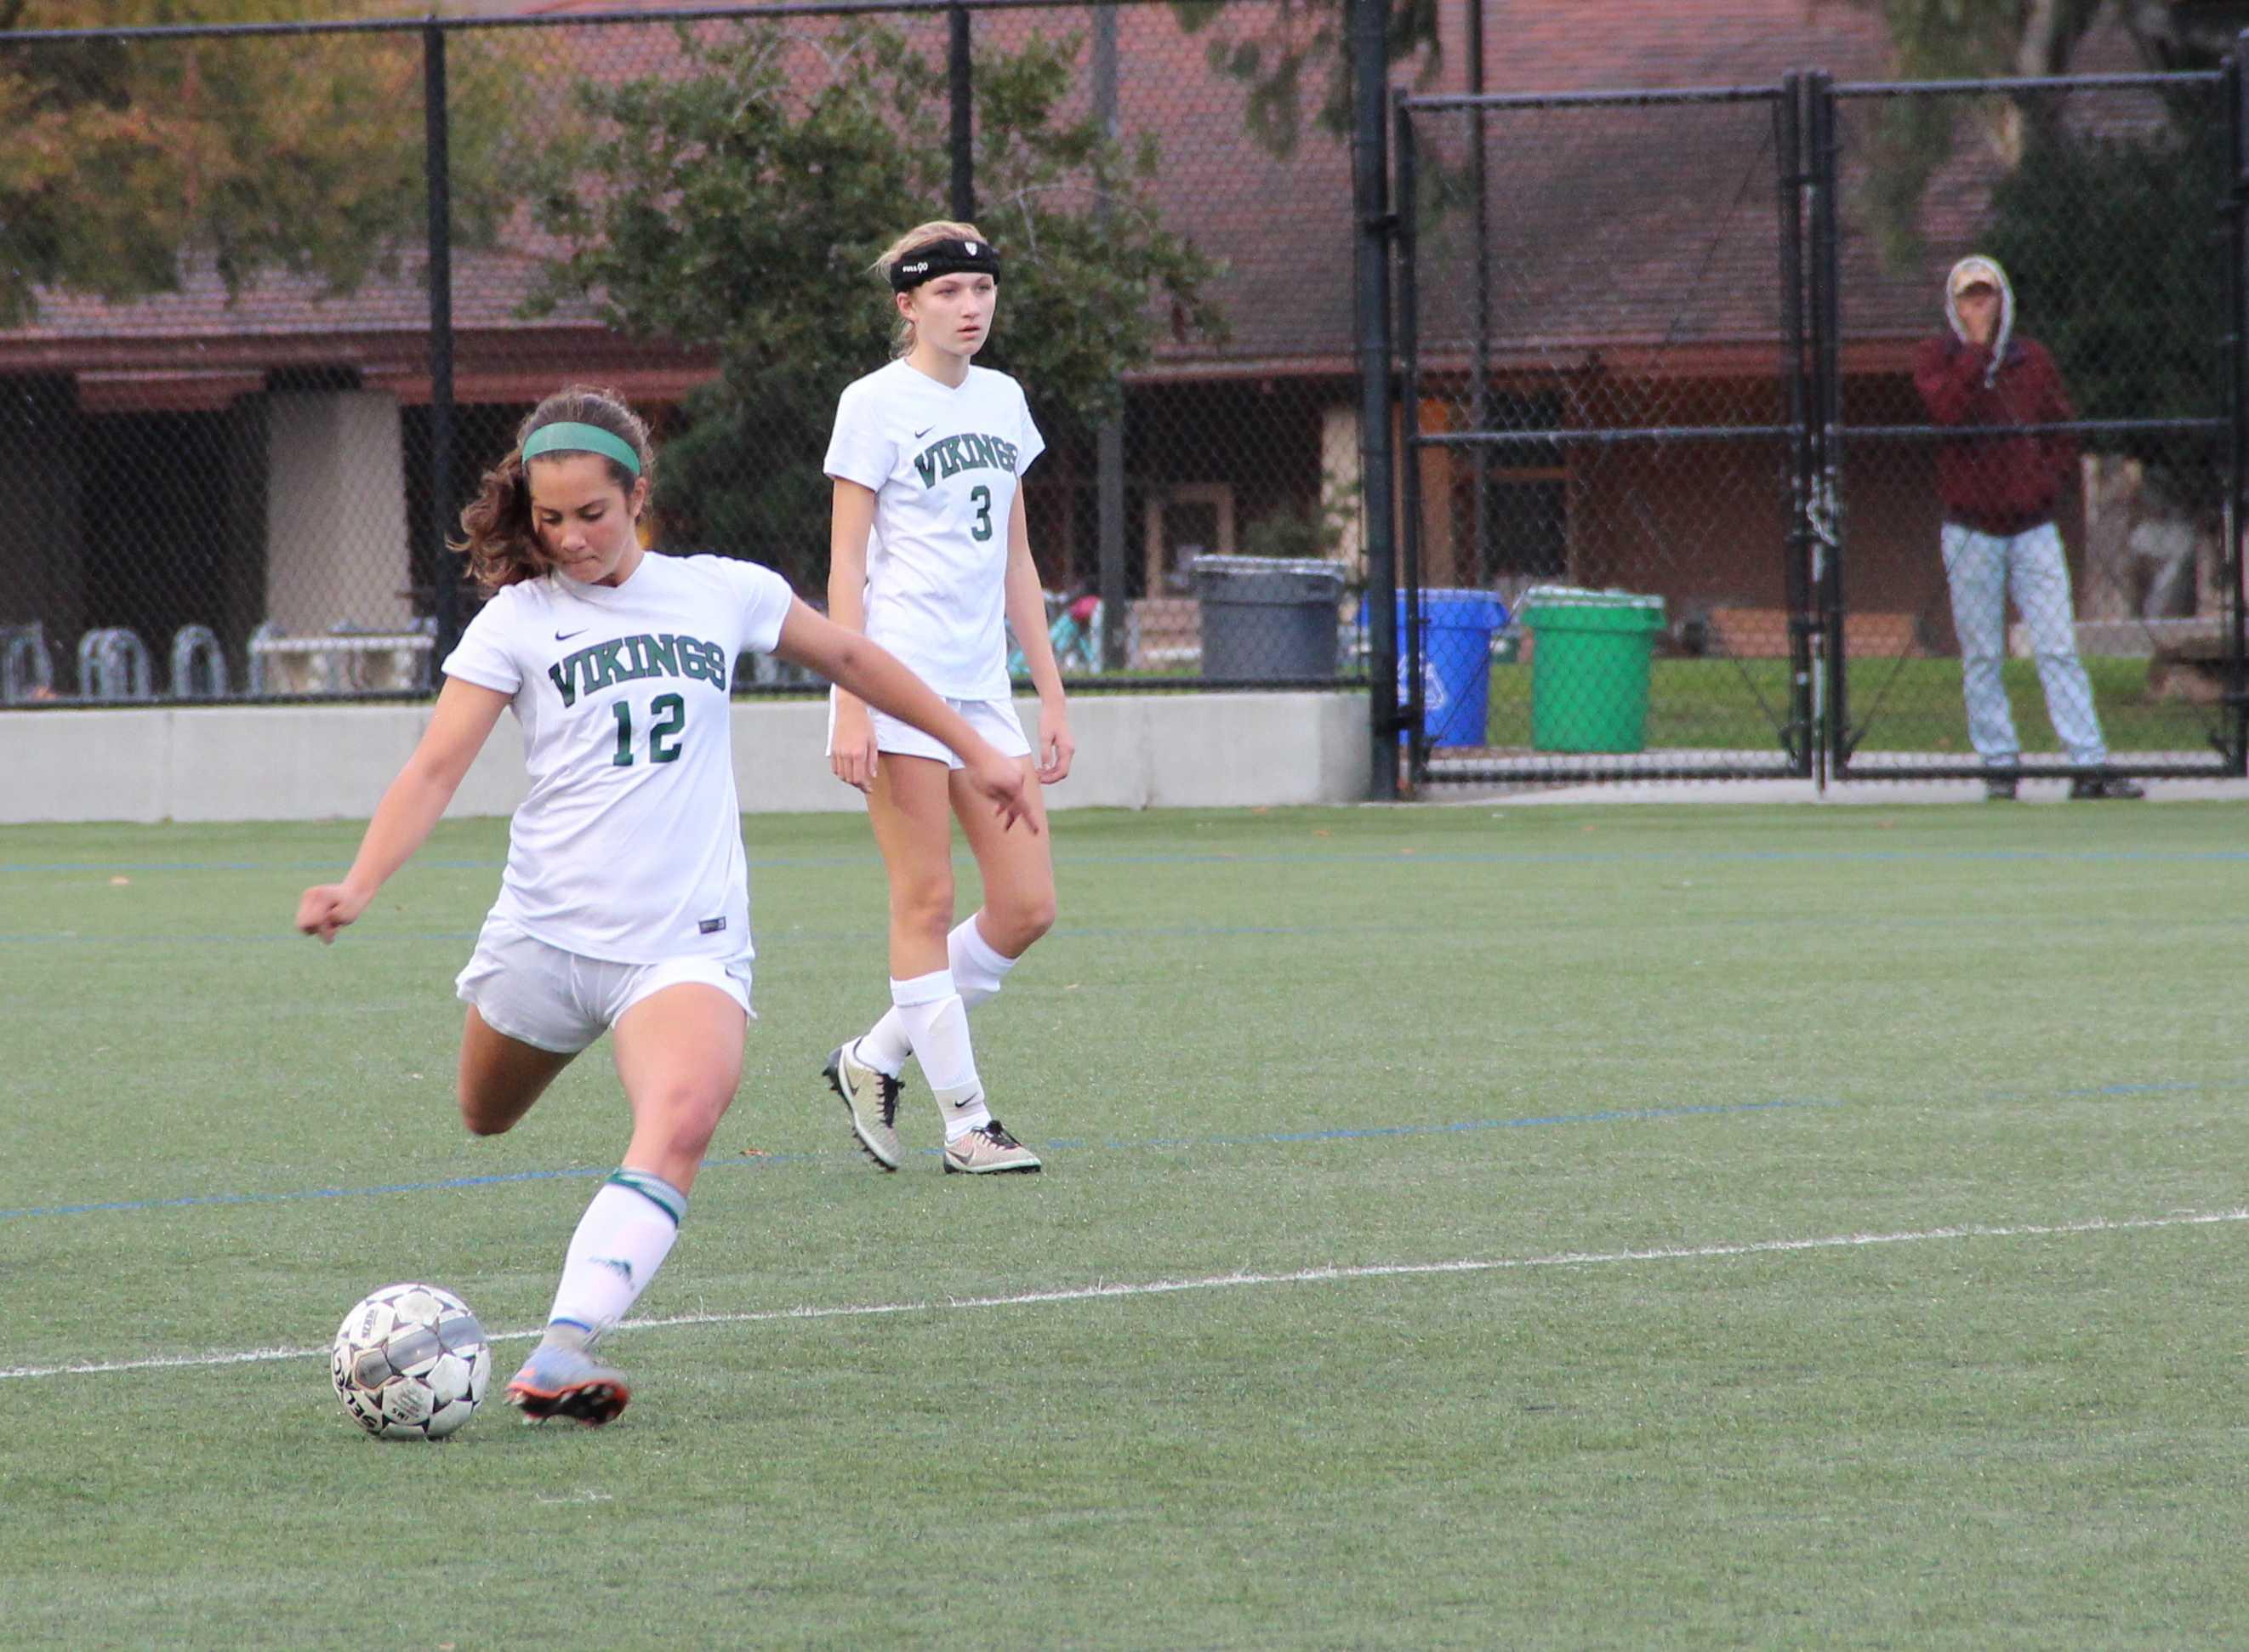 Senior midfielder Talia Malchin passes the ball upfield against Gunn in December. Photo by Rachel Code.